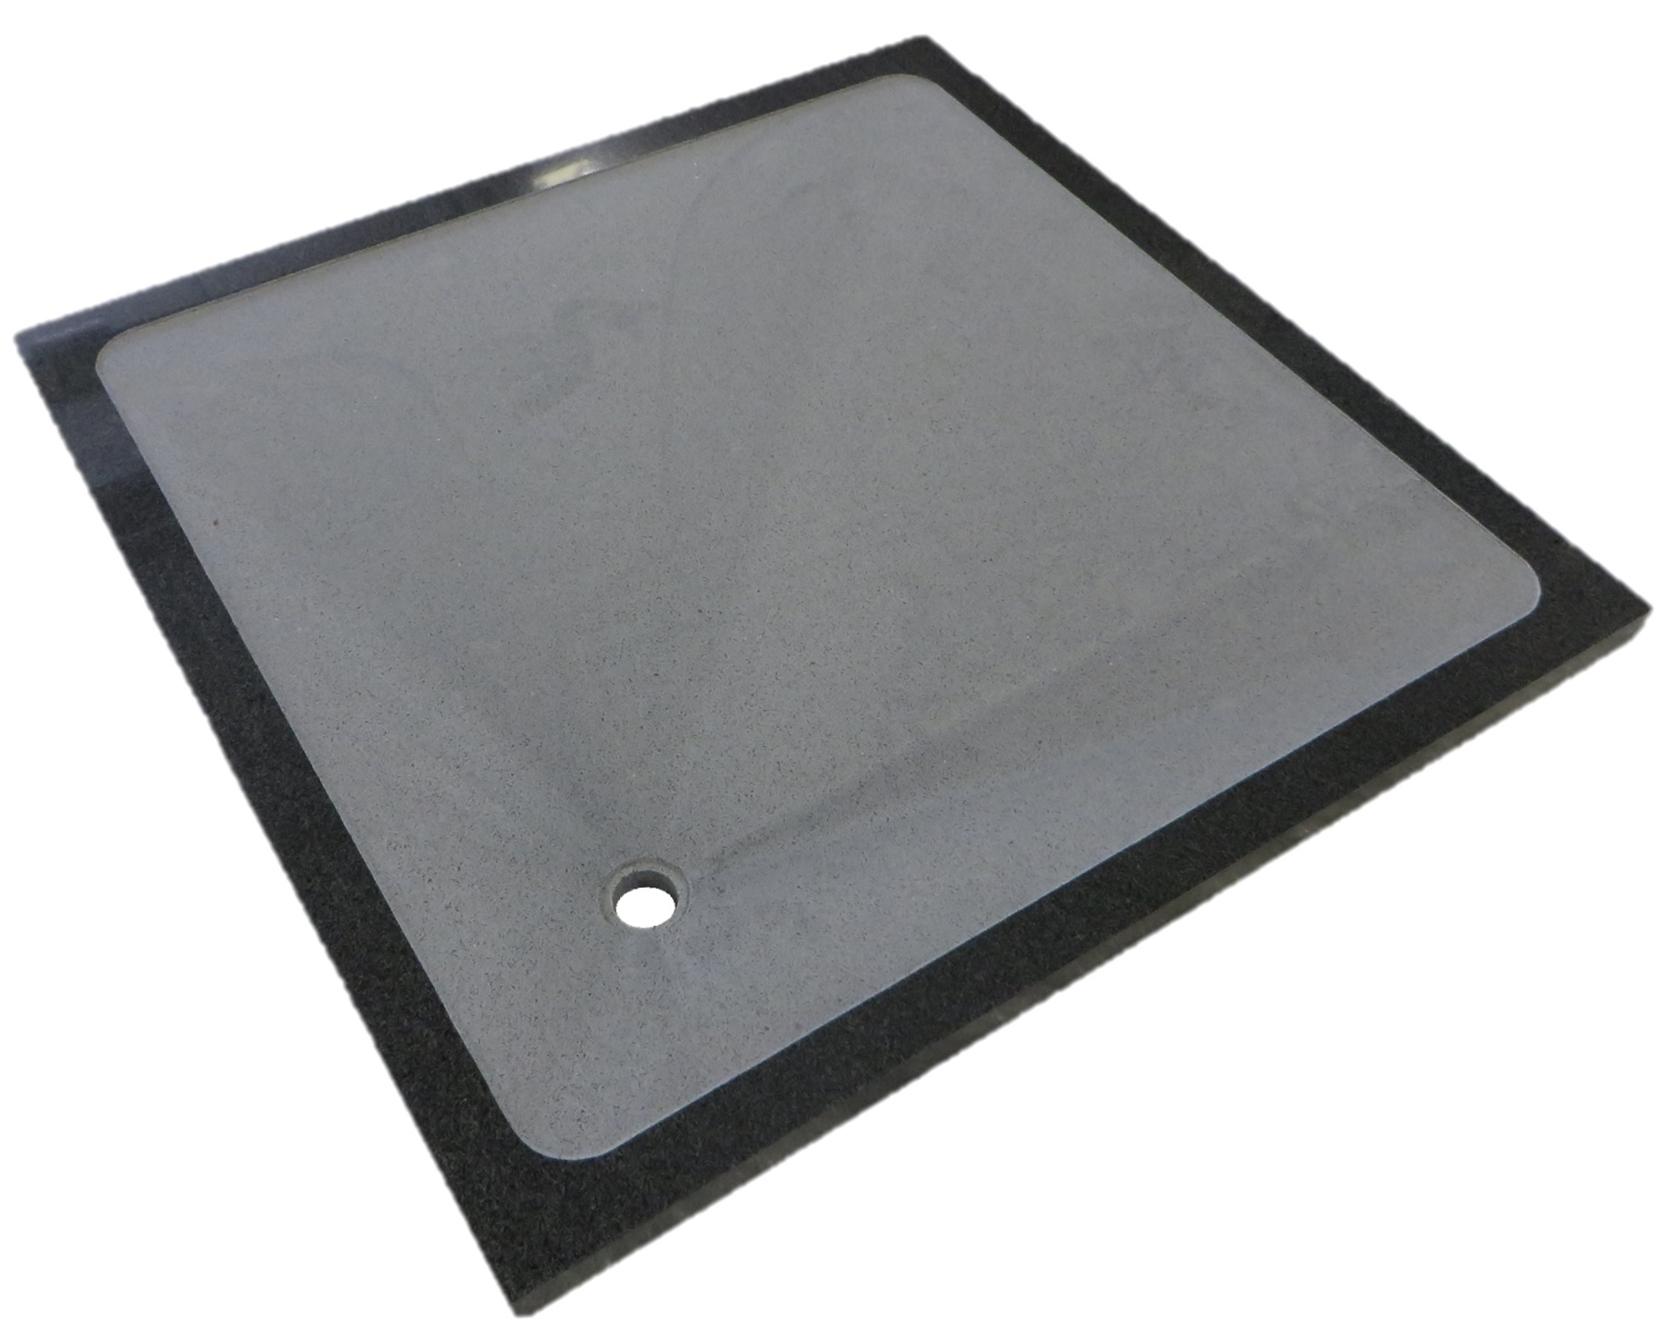 duschtassen granit geyger. Black Bedroom Furniture Sets. Home Design Ideas